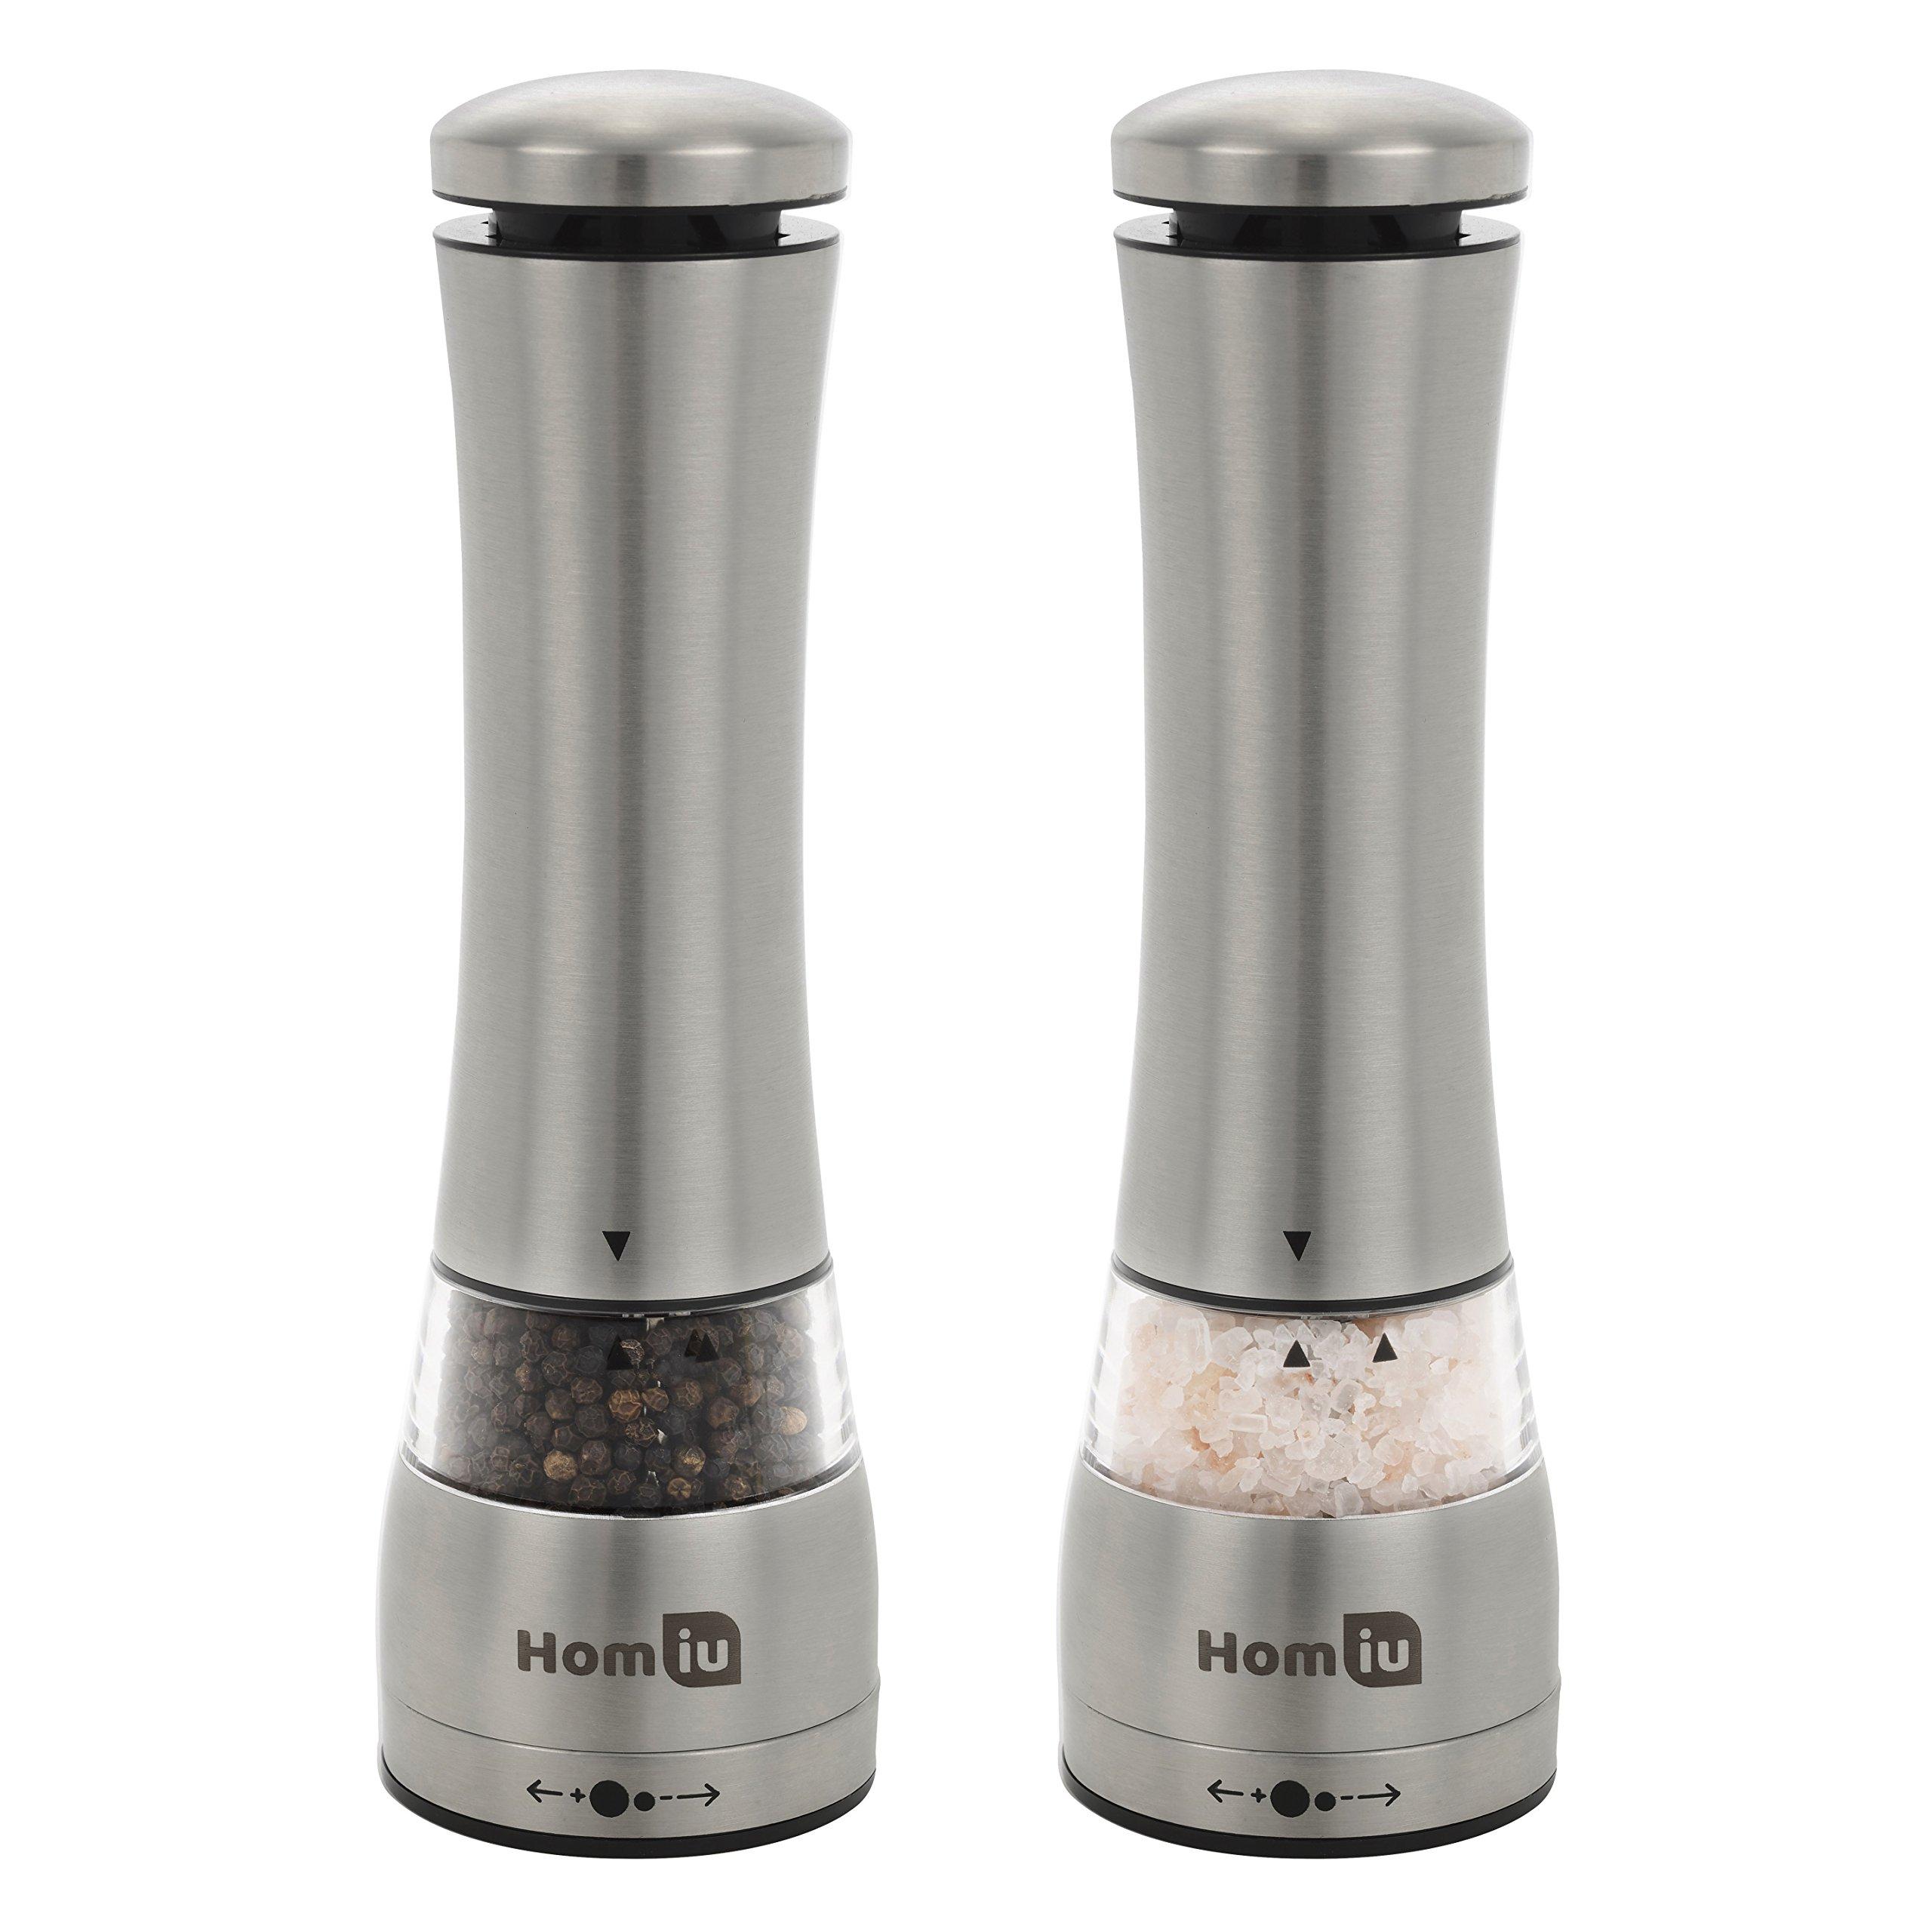 Homiu Illuminated Large Electronic Stainless Steel Salt & Pepper Mill Grinder Set with Adjustable Grinder - Silver